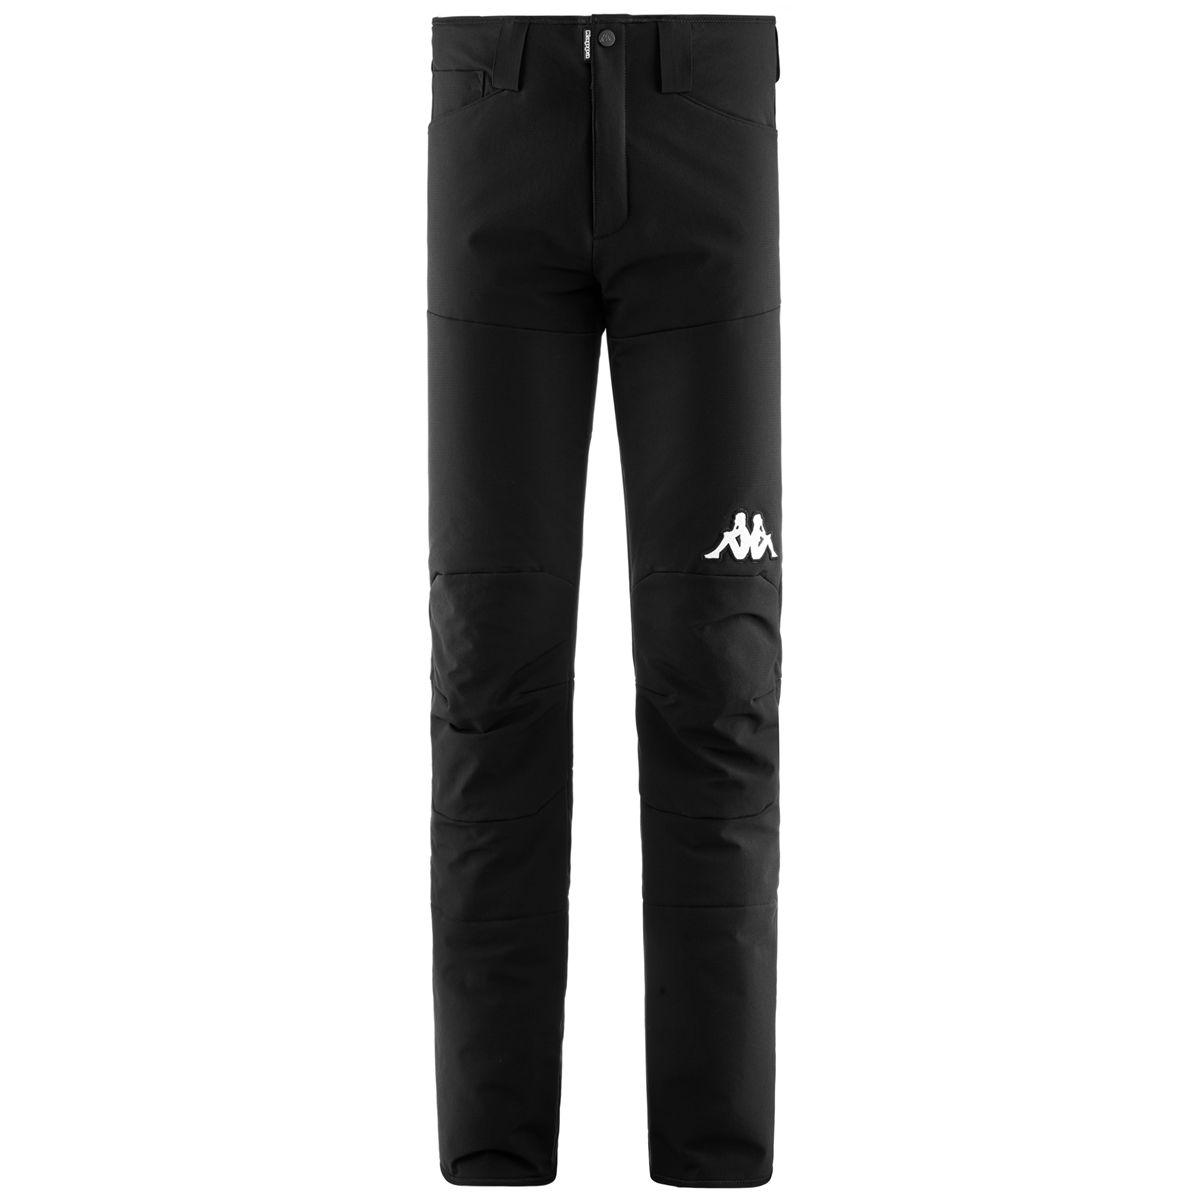 Kappa Pantaloni uomo-302HLK0